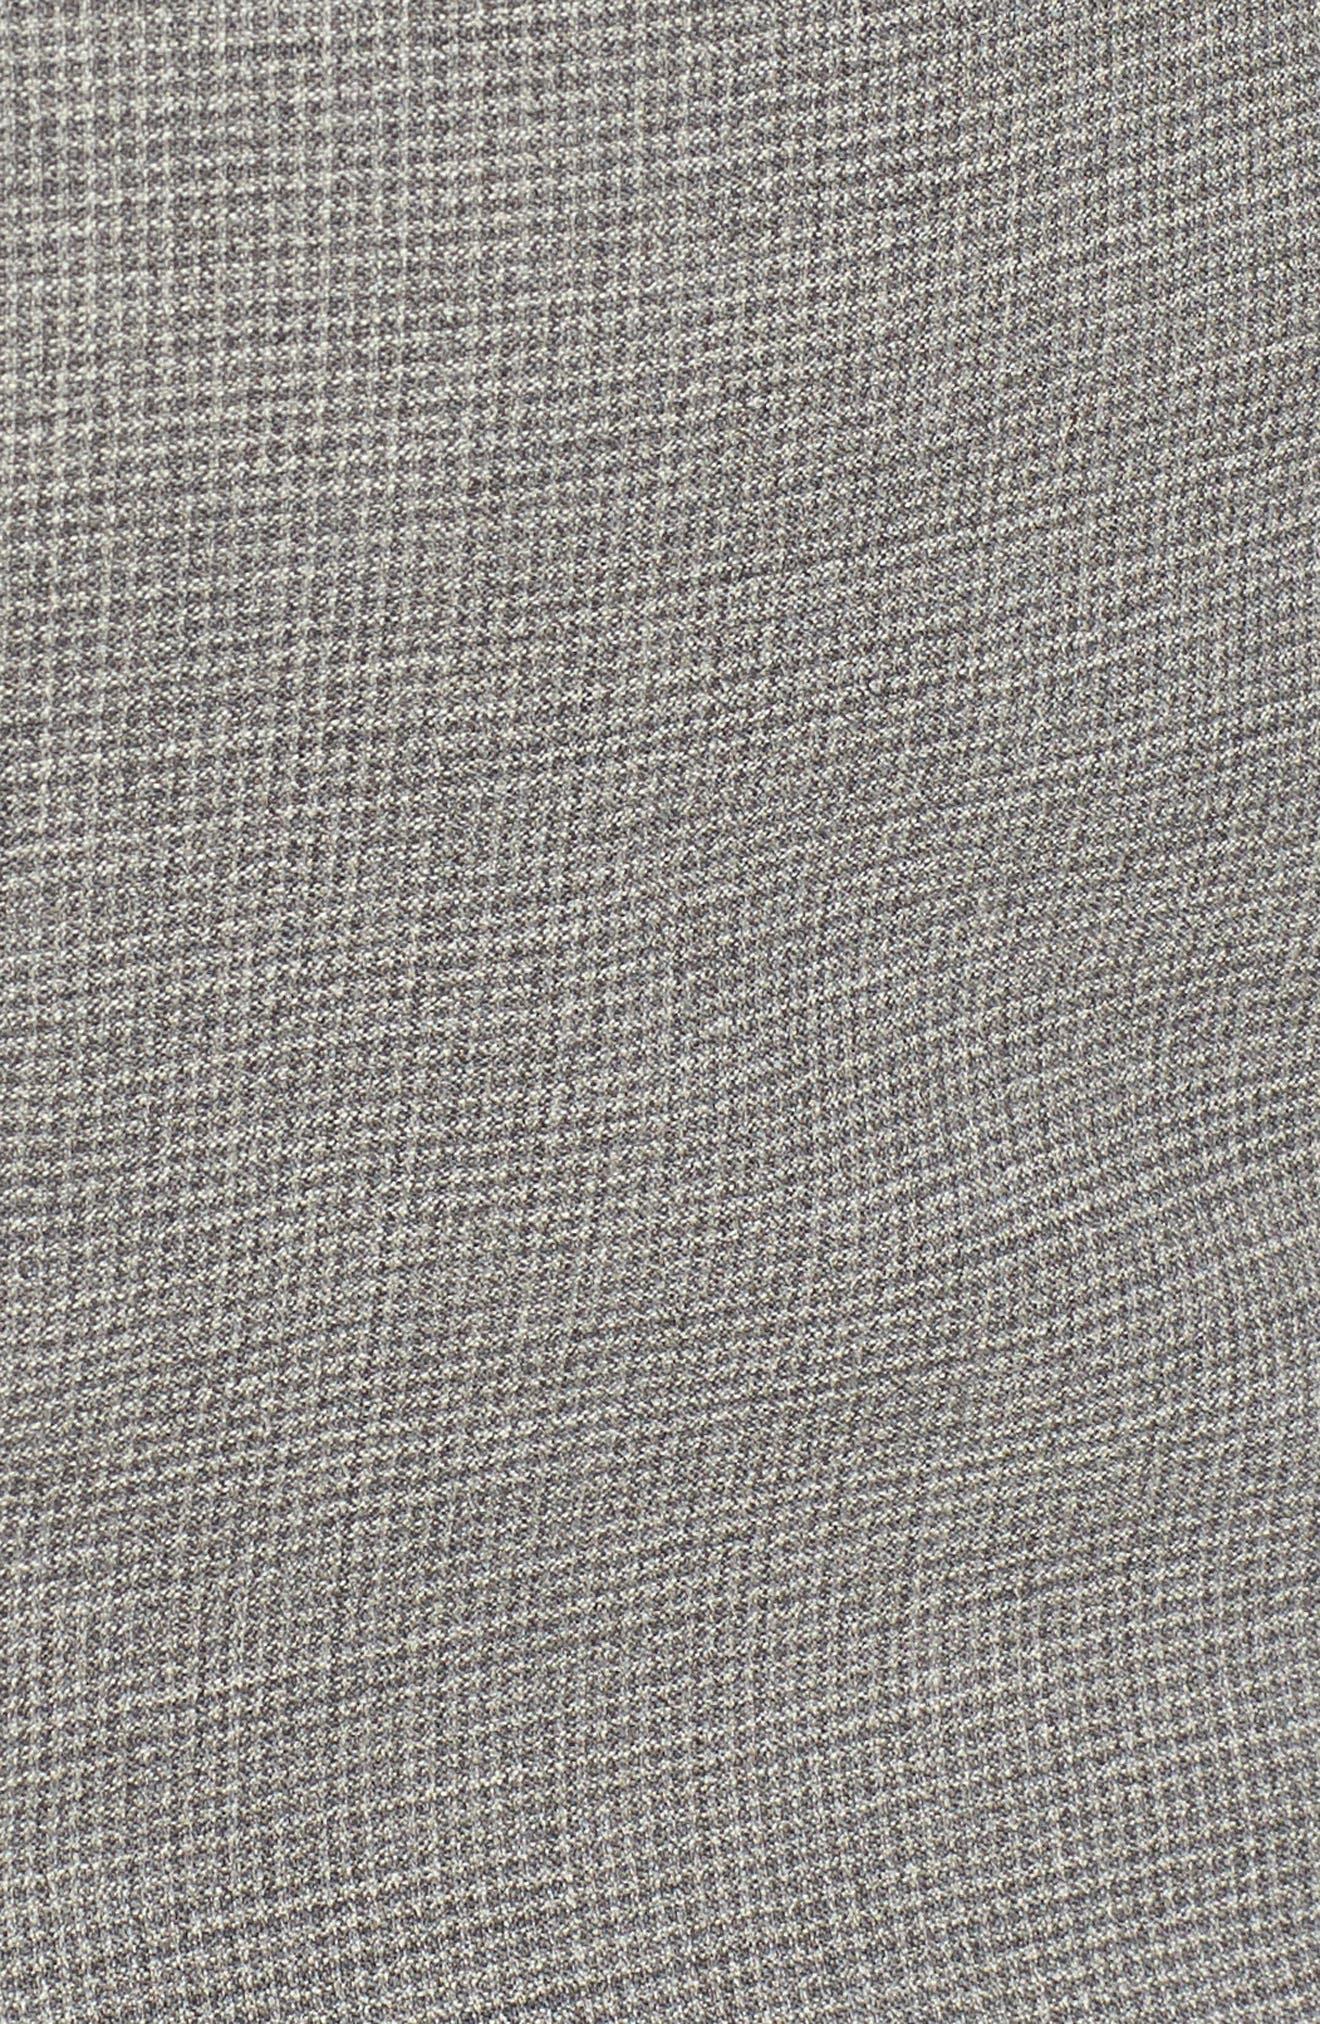 Dewisa Check Wool Sheath Dress,                             Alternate thumbnail 5, color,